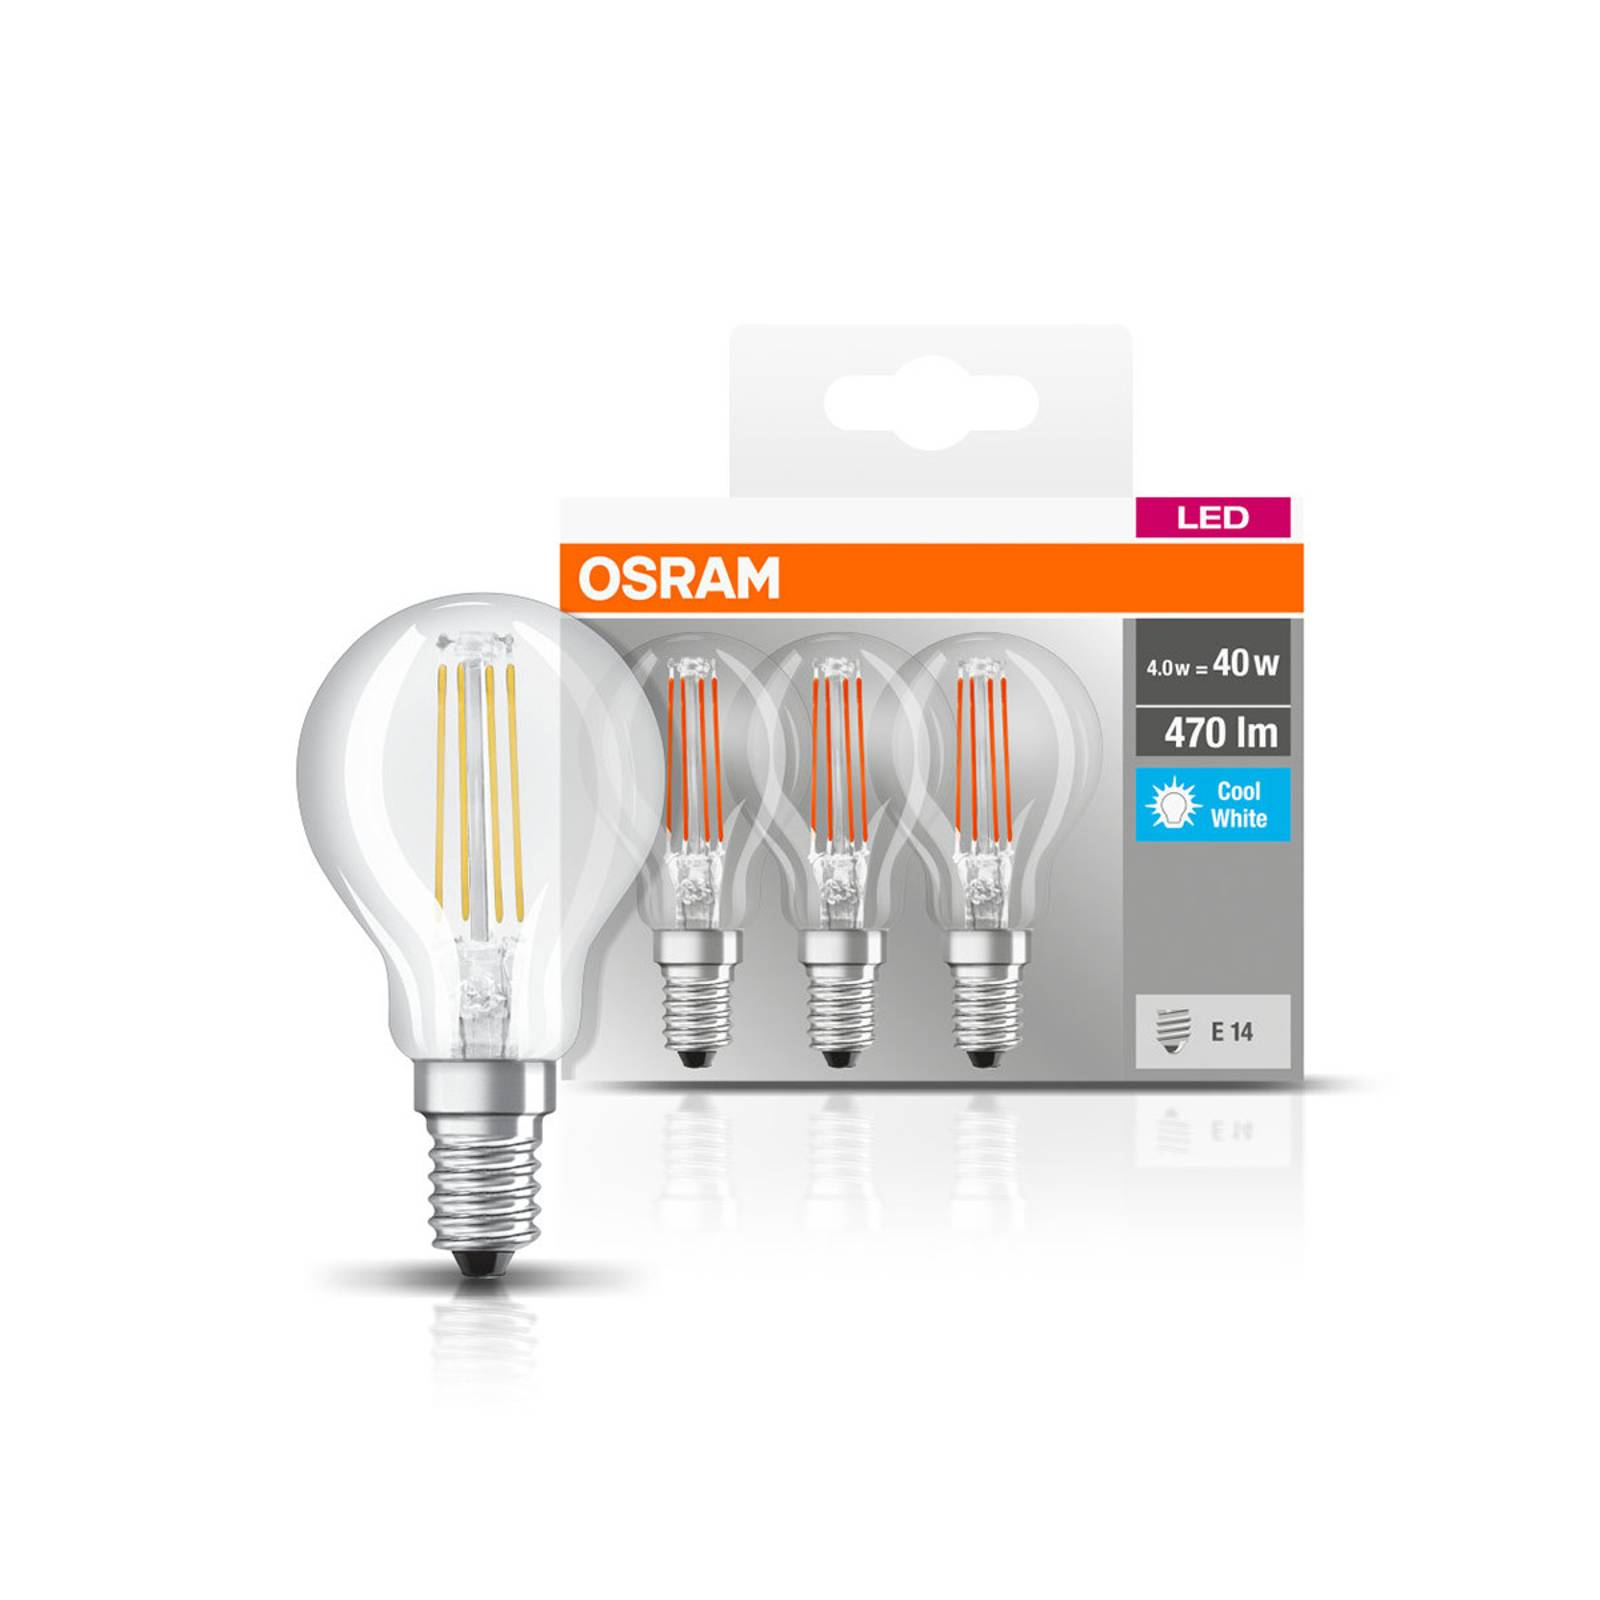 OSRAM-LED-lamppu E14 P40 4W Filament 840 470lm, 3